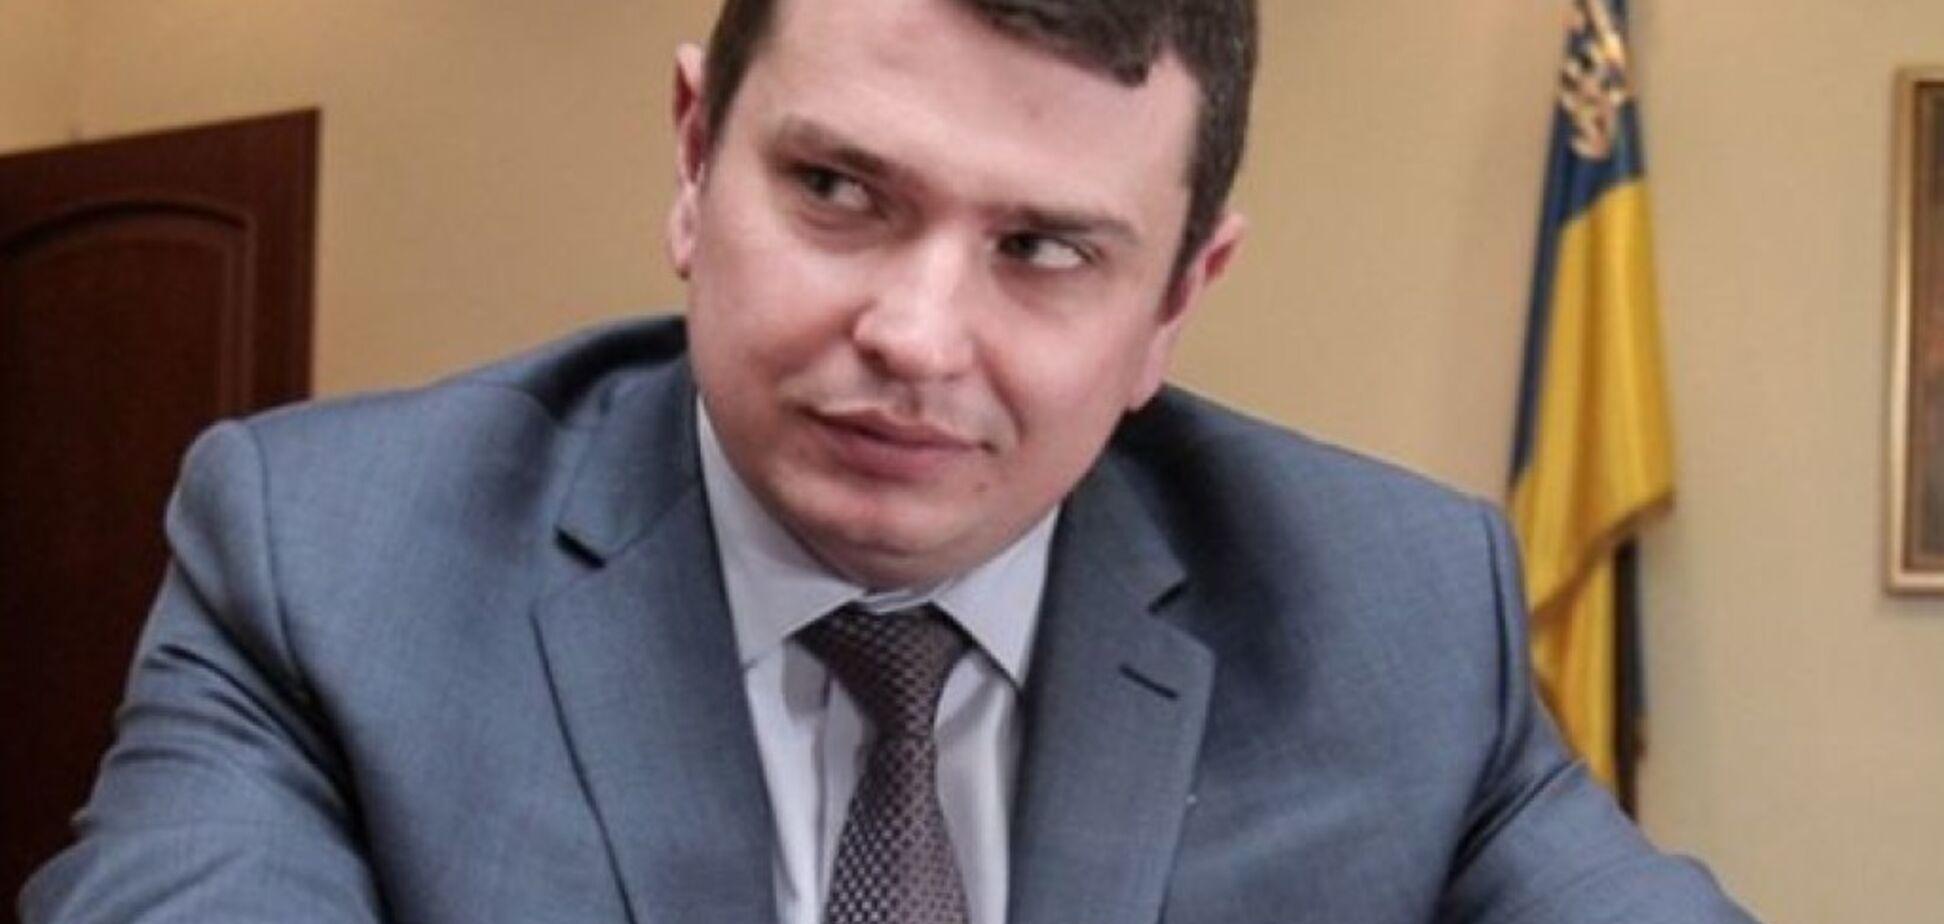 Дело Сытника: суд предоставил ГПУ доступ к телефонам еще 2 человек